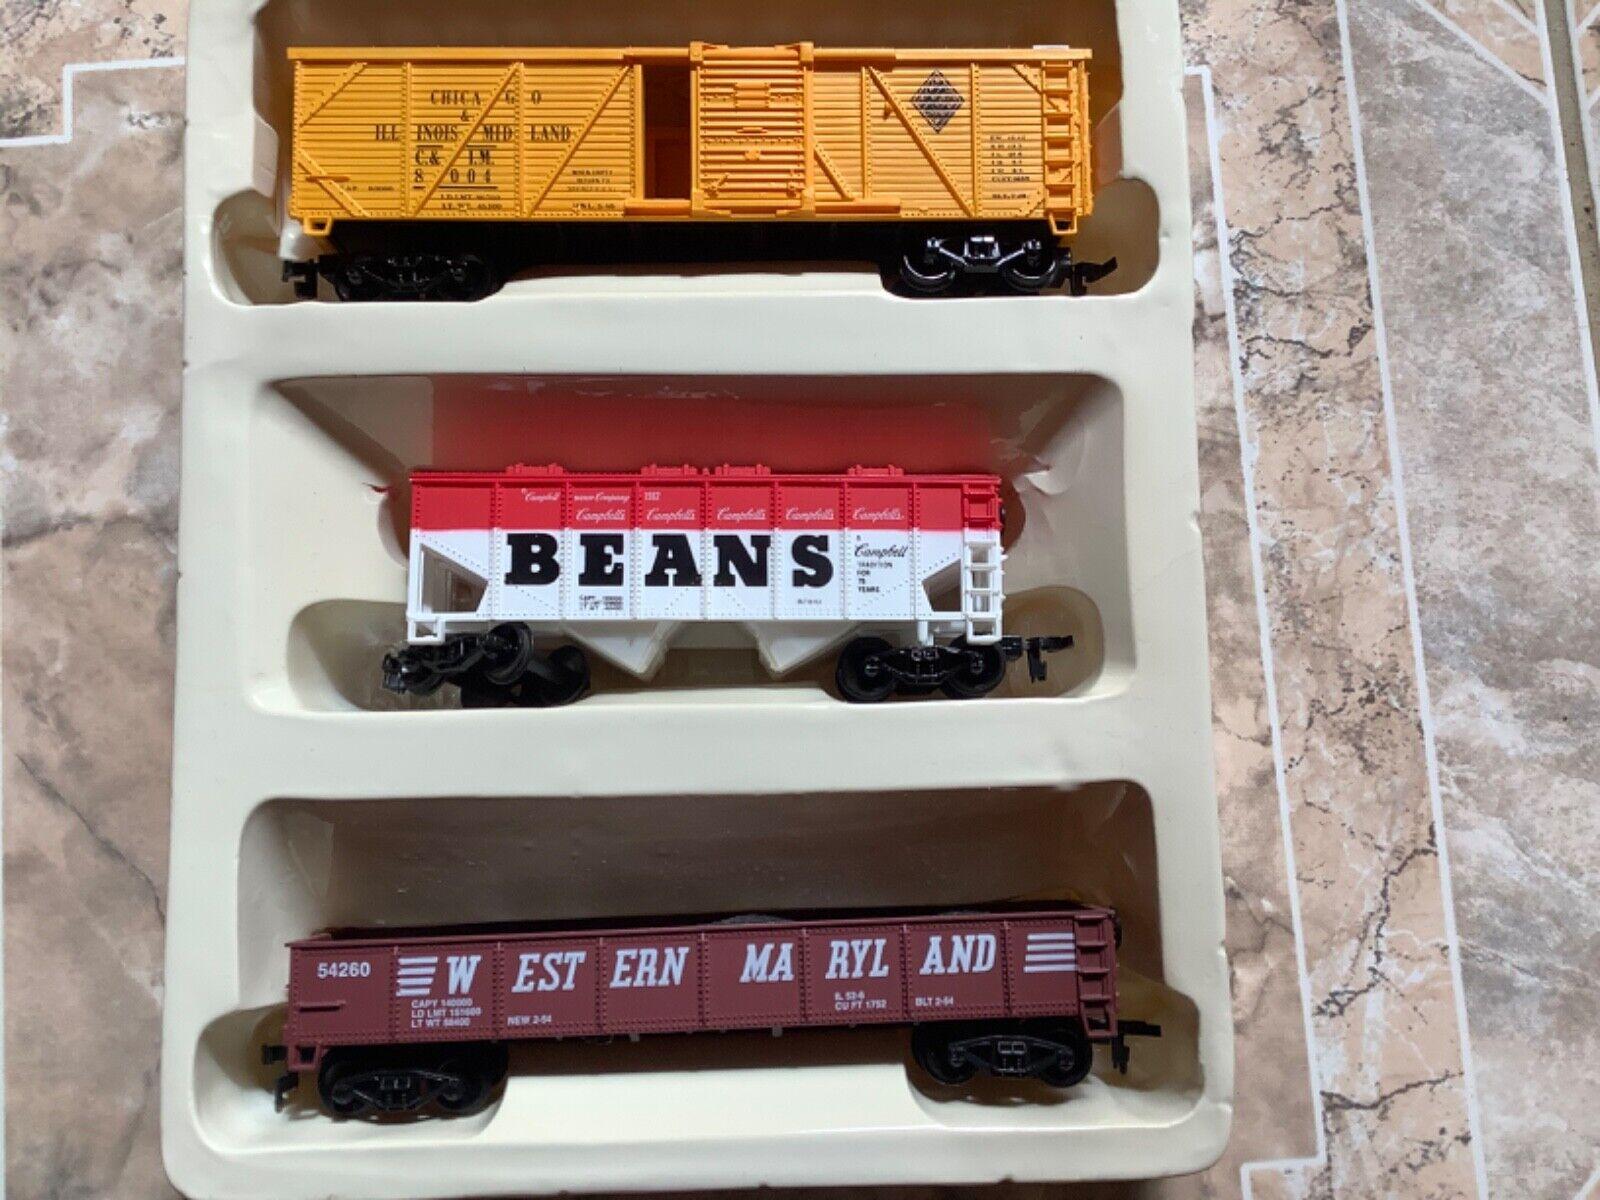 Life-Like 8459 H0 3-Pack USA Güterwagen Chicago Beans Maryland unbespielt OVP